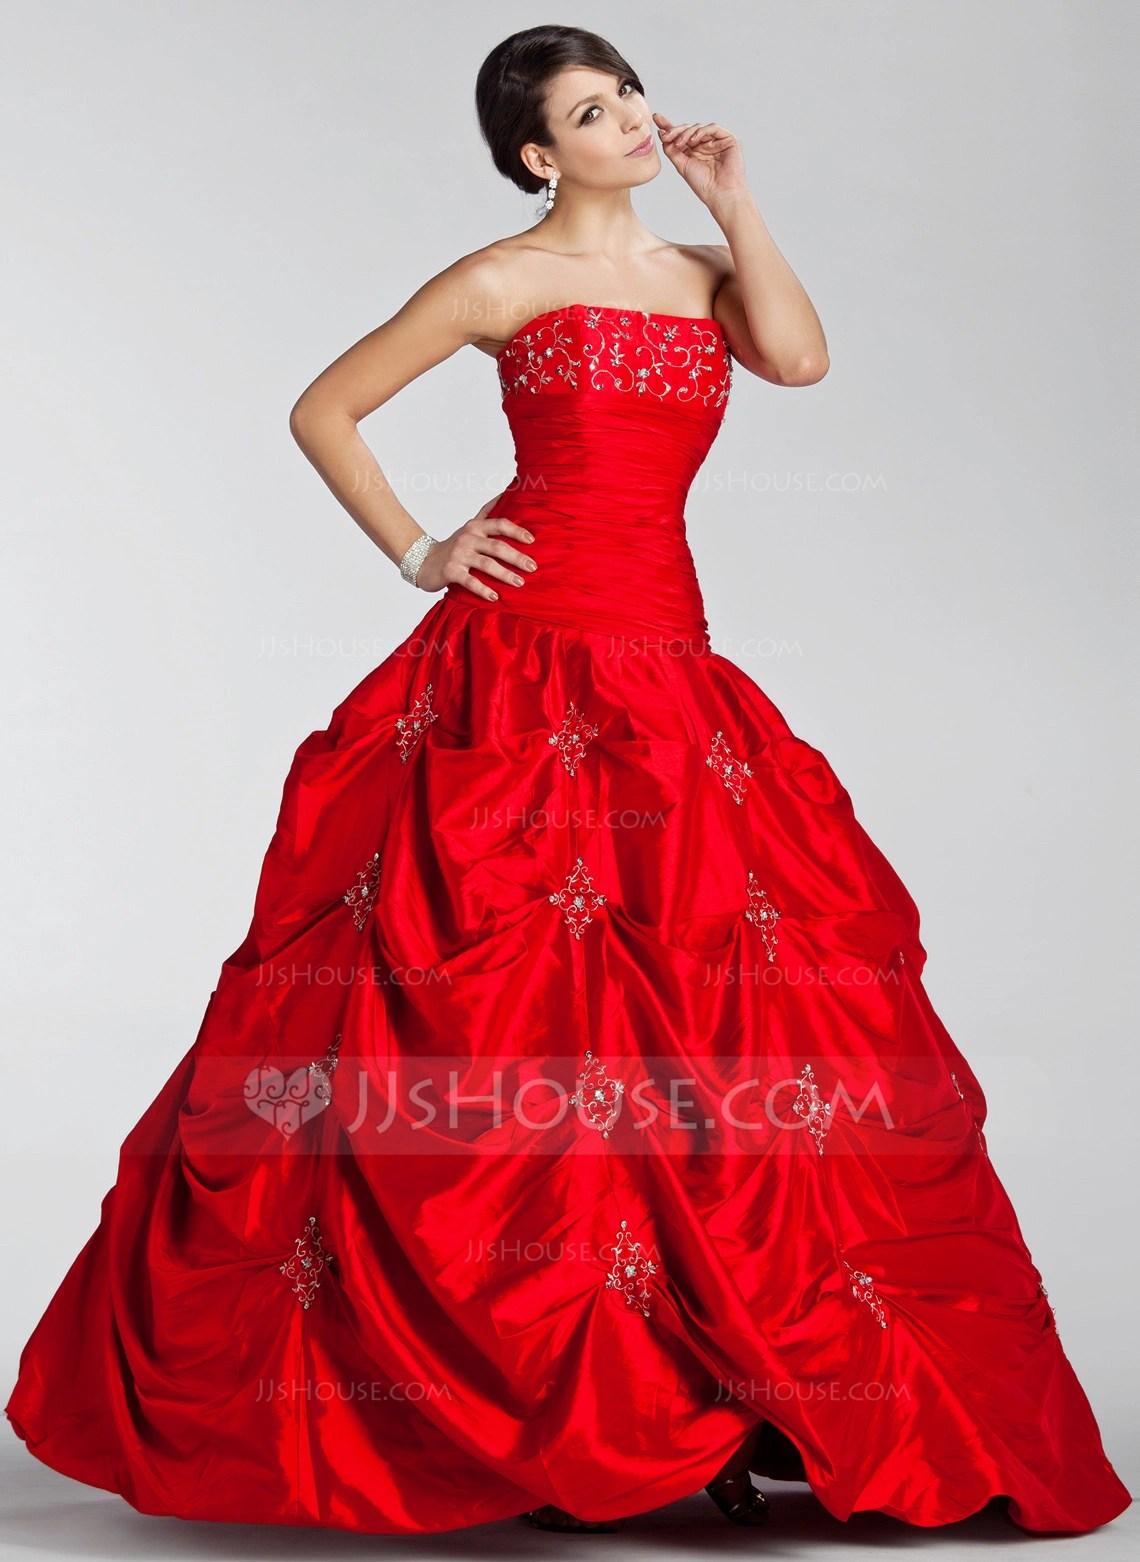 DuchesseLinie Trgerlos Bodenlang Taft Quinceaera Kleid